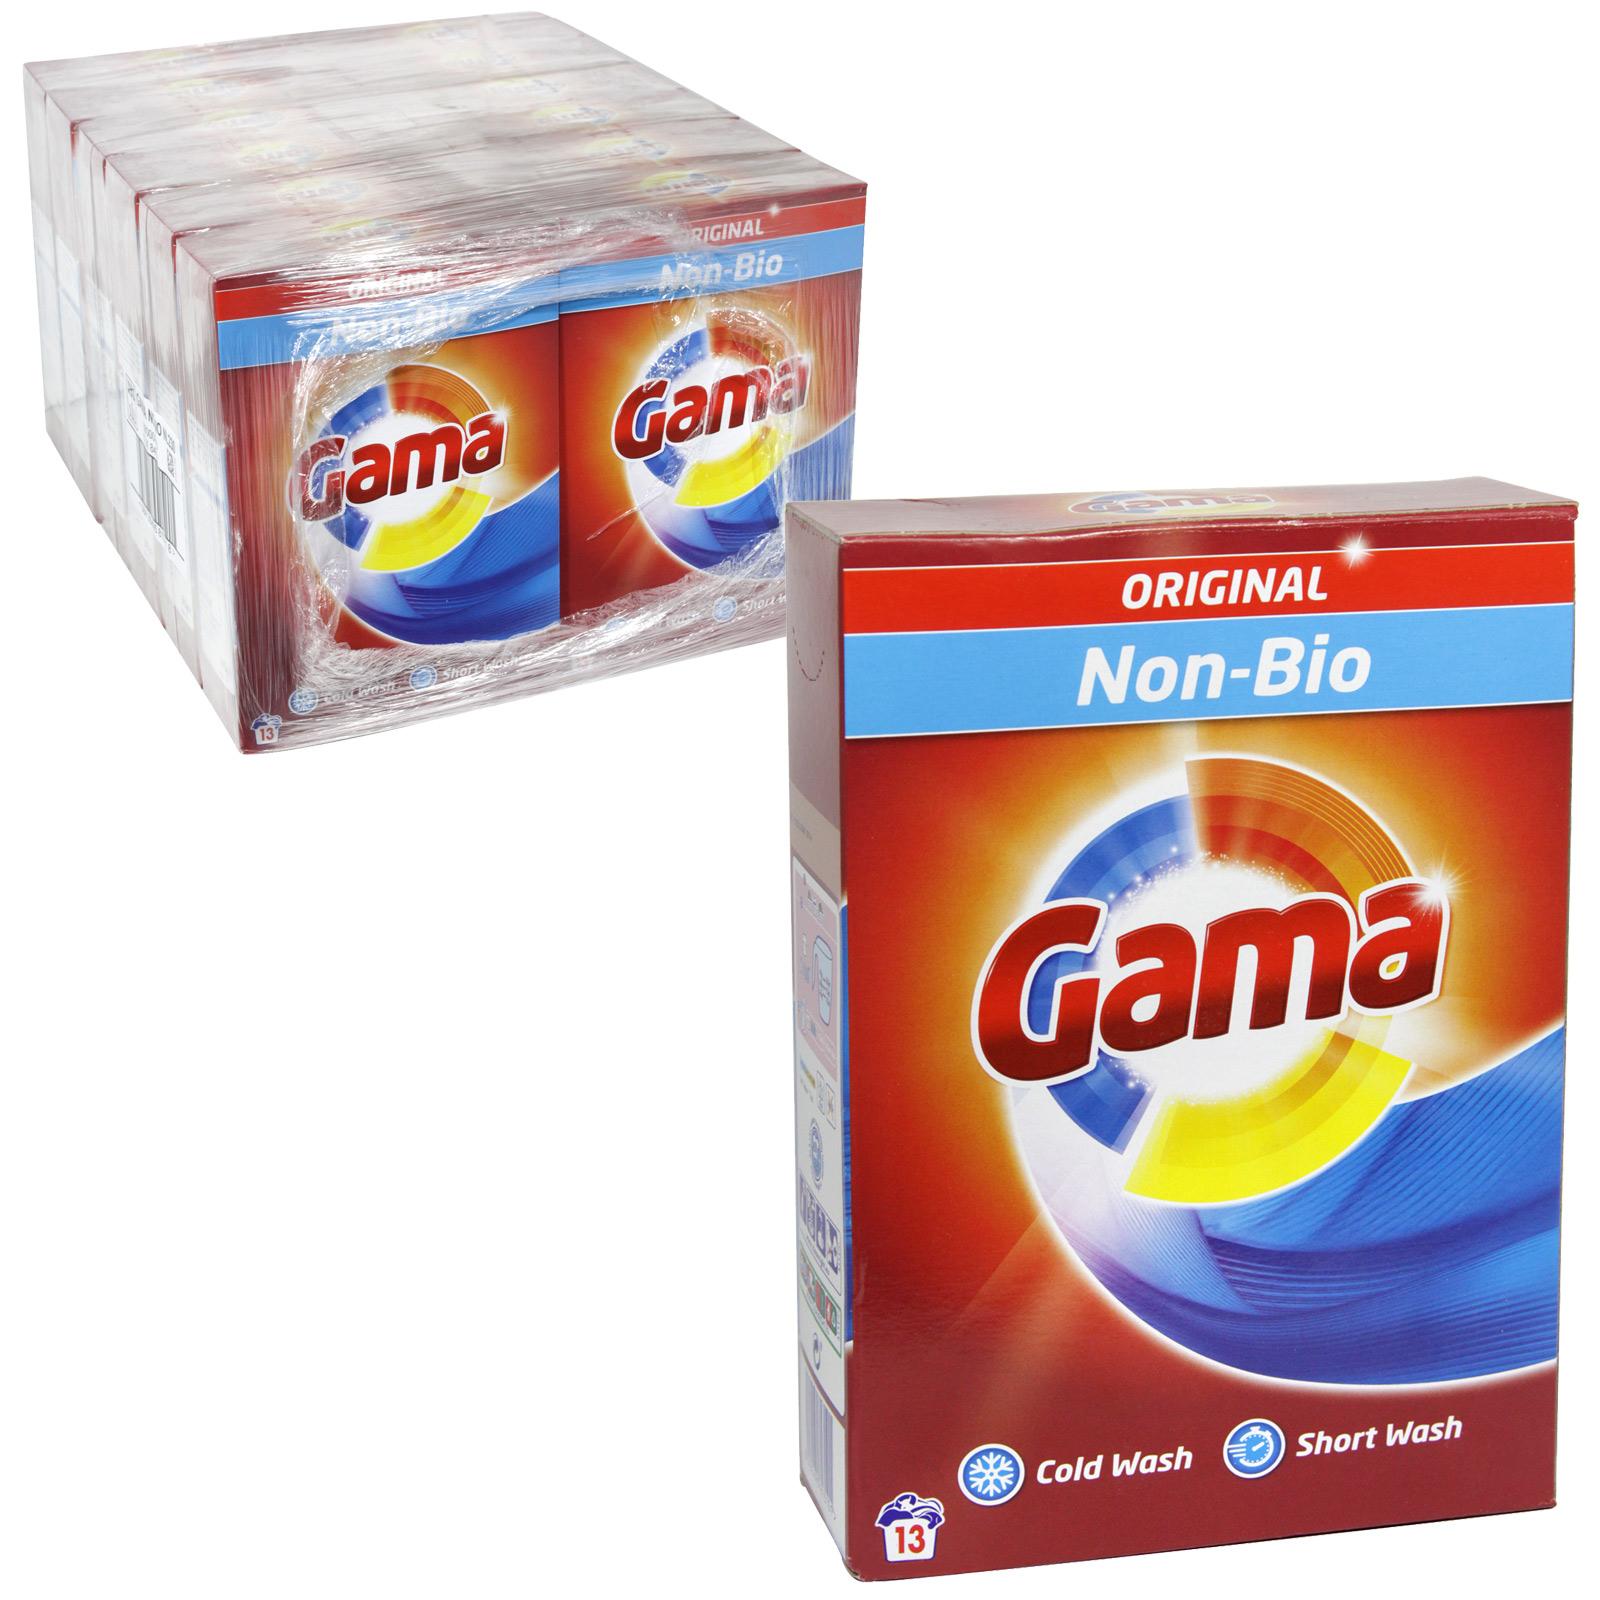 GAMA 13 WASH LAUNDRY POWDER 845GM NON-BIO X12